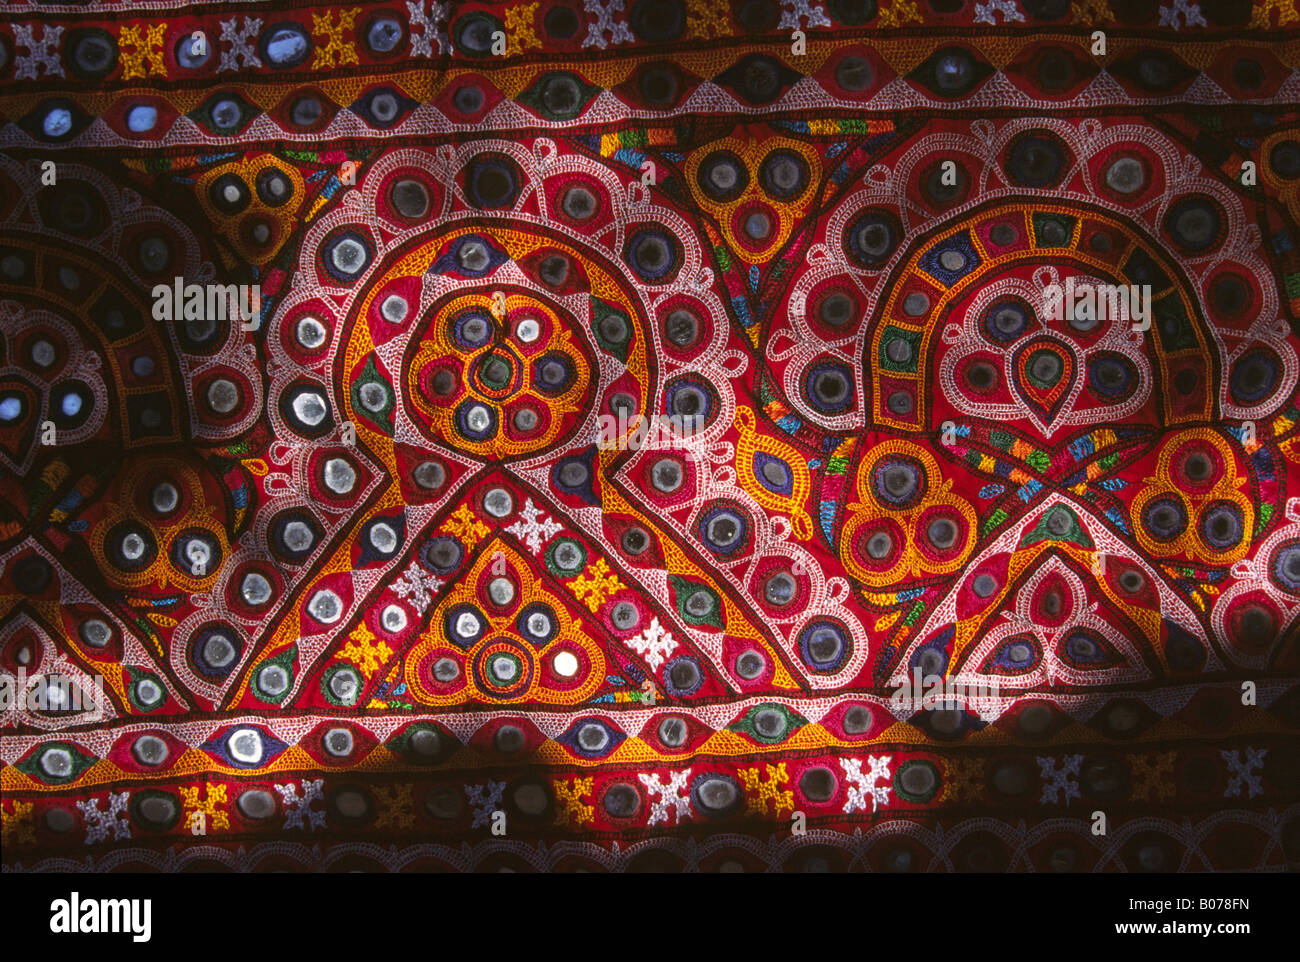 India Gujerat Rann of Kutch crafts Satapar Village Ahir embroidered dowry bag detail - Stock Image